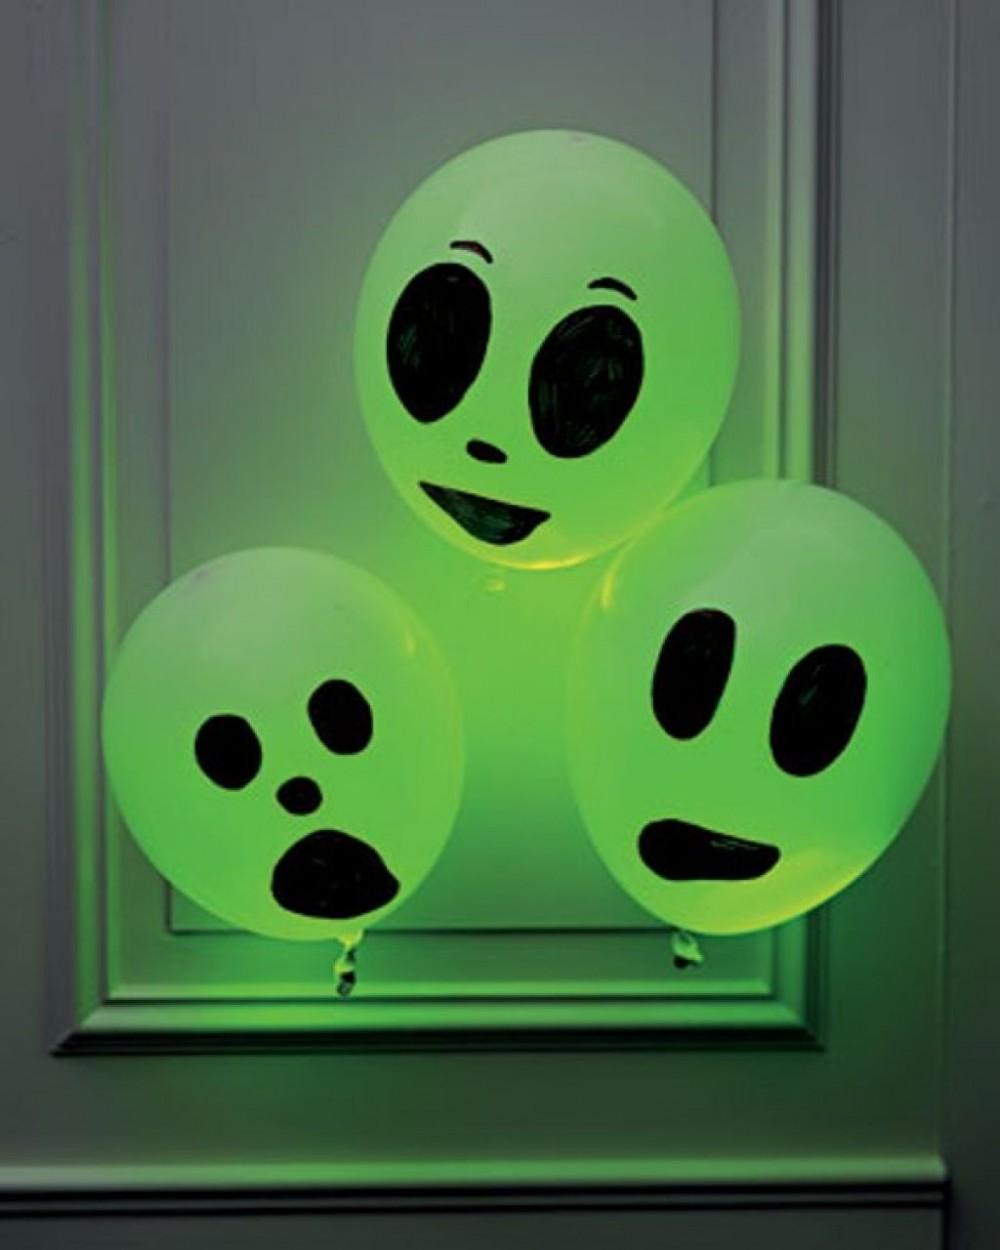 Balloons With Glow Sticks in Them Glow Sticks | Theinthing